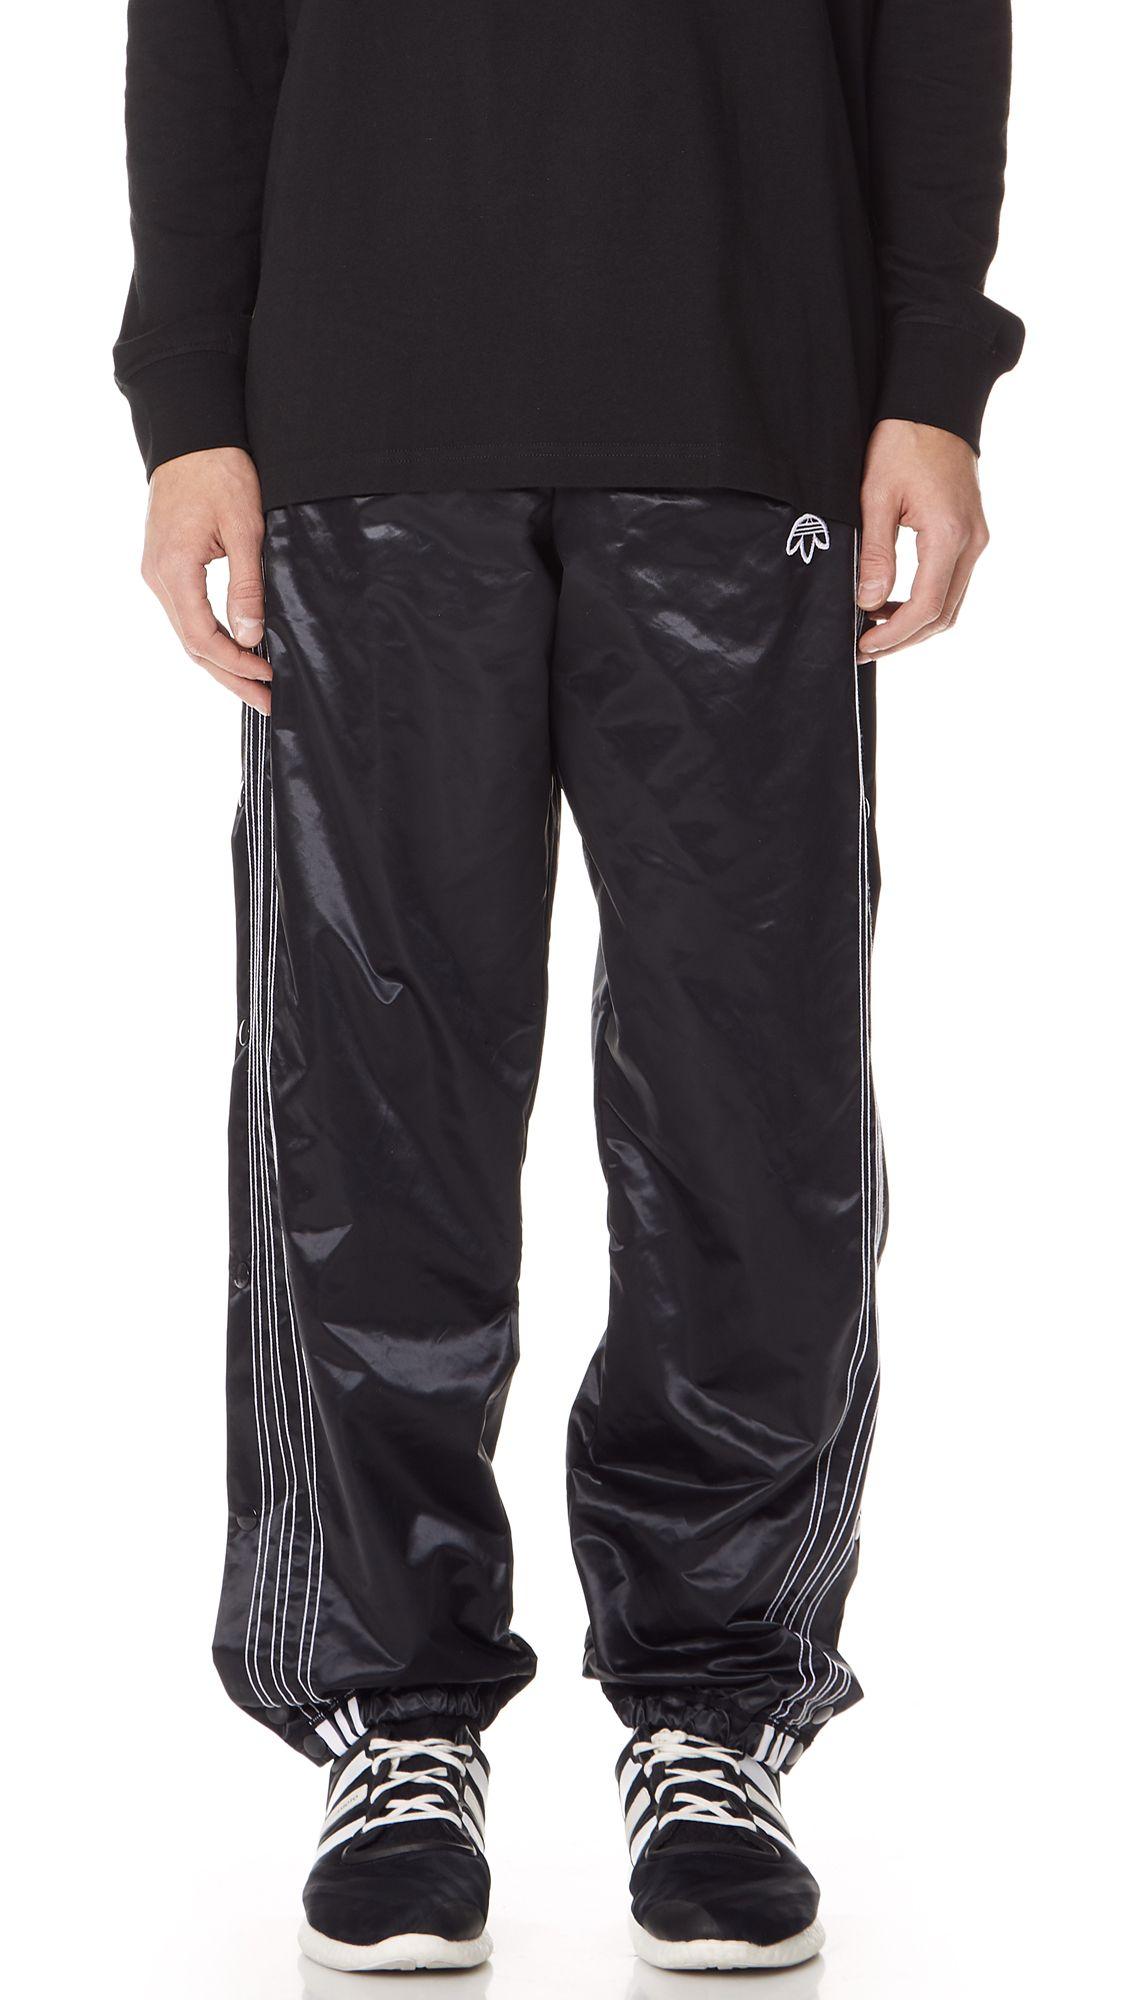 oh adibreak pantaloni neri adidas originali da alexander wang uomini